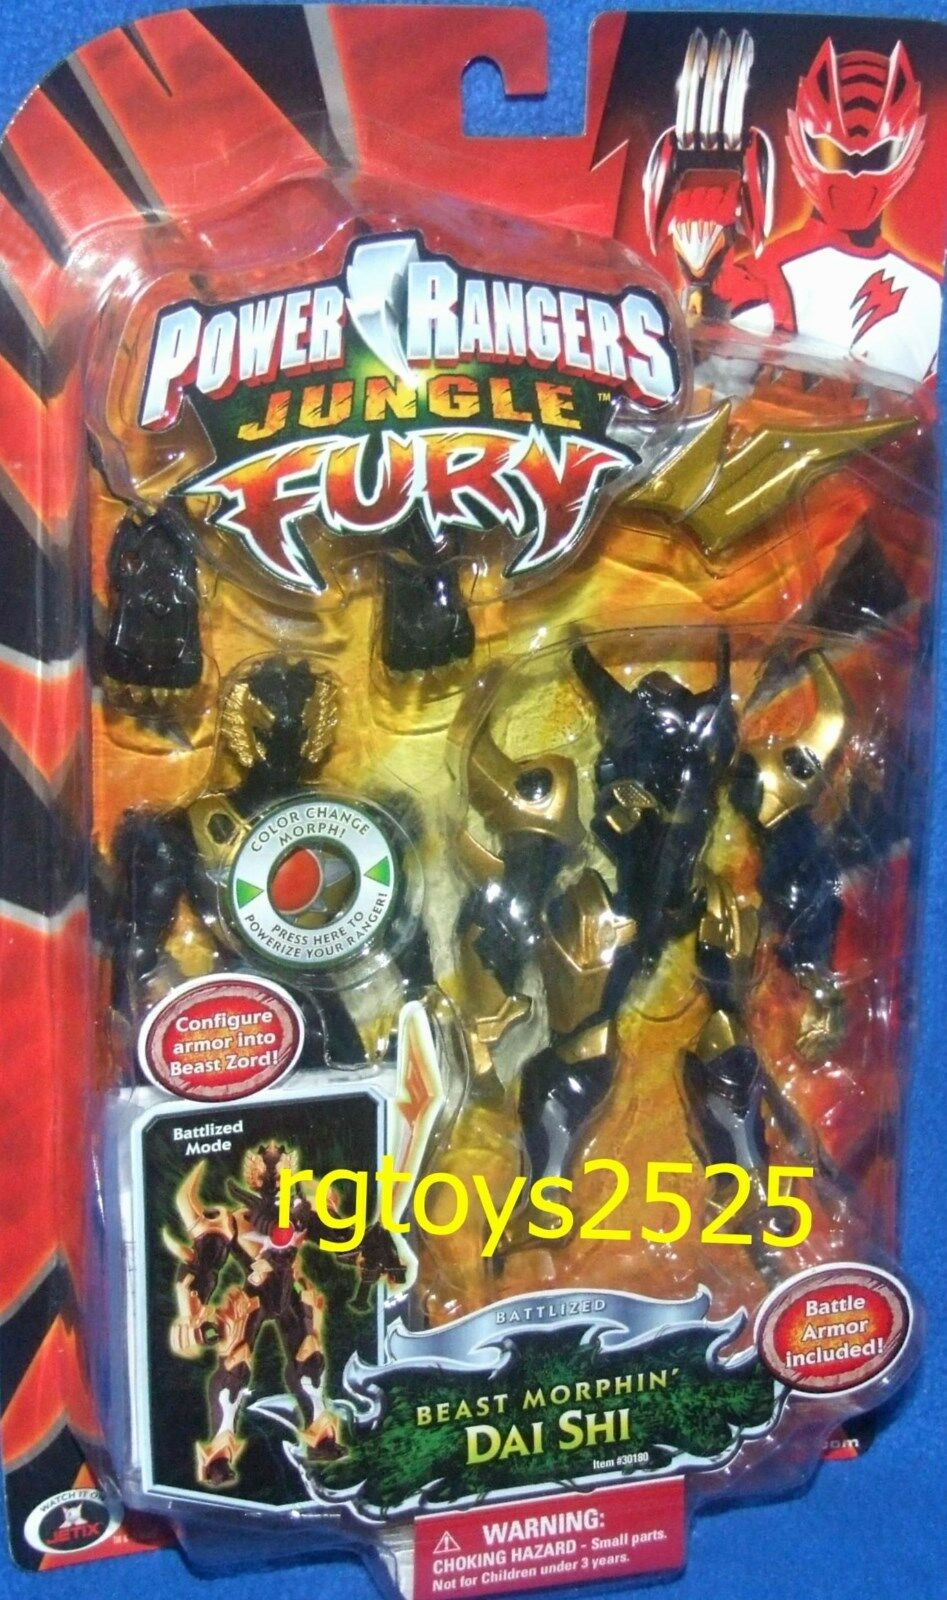 energia Rangers Jungle Fury 5 Beast Morphin DAI SHI Factory Sealed nuovo 2008